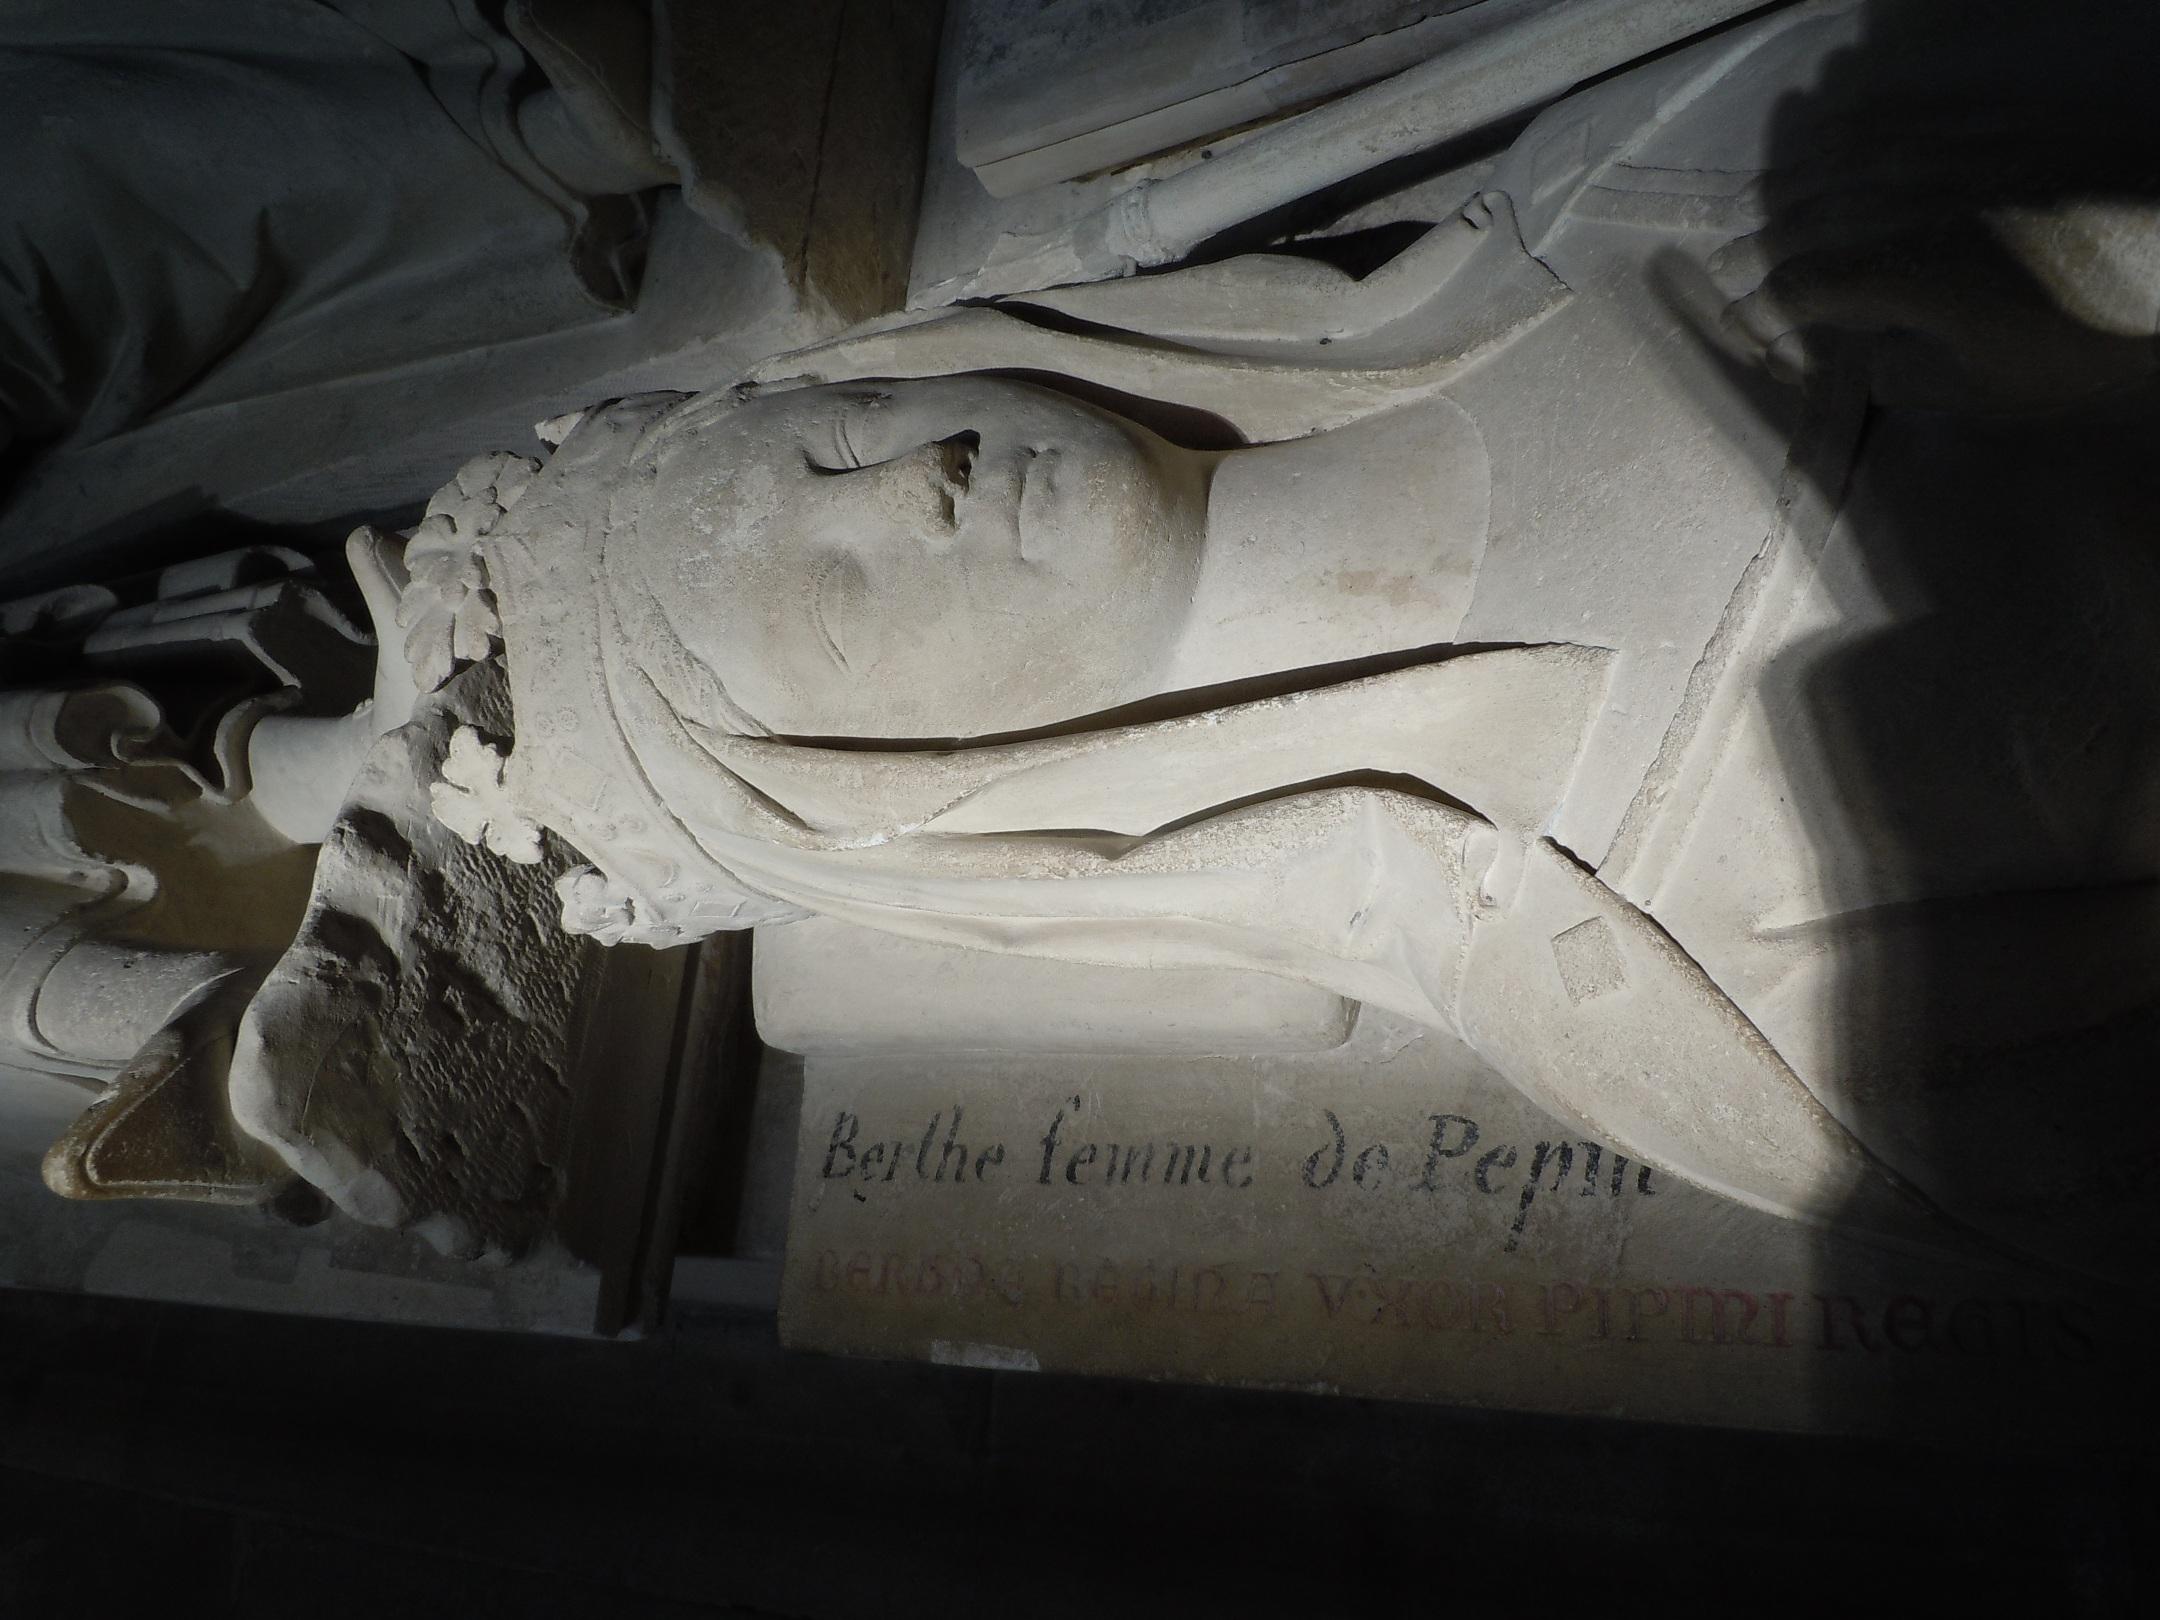 Detail of effigy of Queen Bertrada de Laon in the Basilica of Saint-Denis, Paris, France